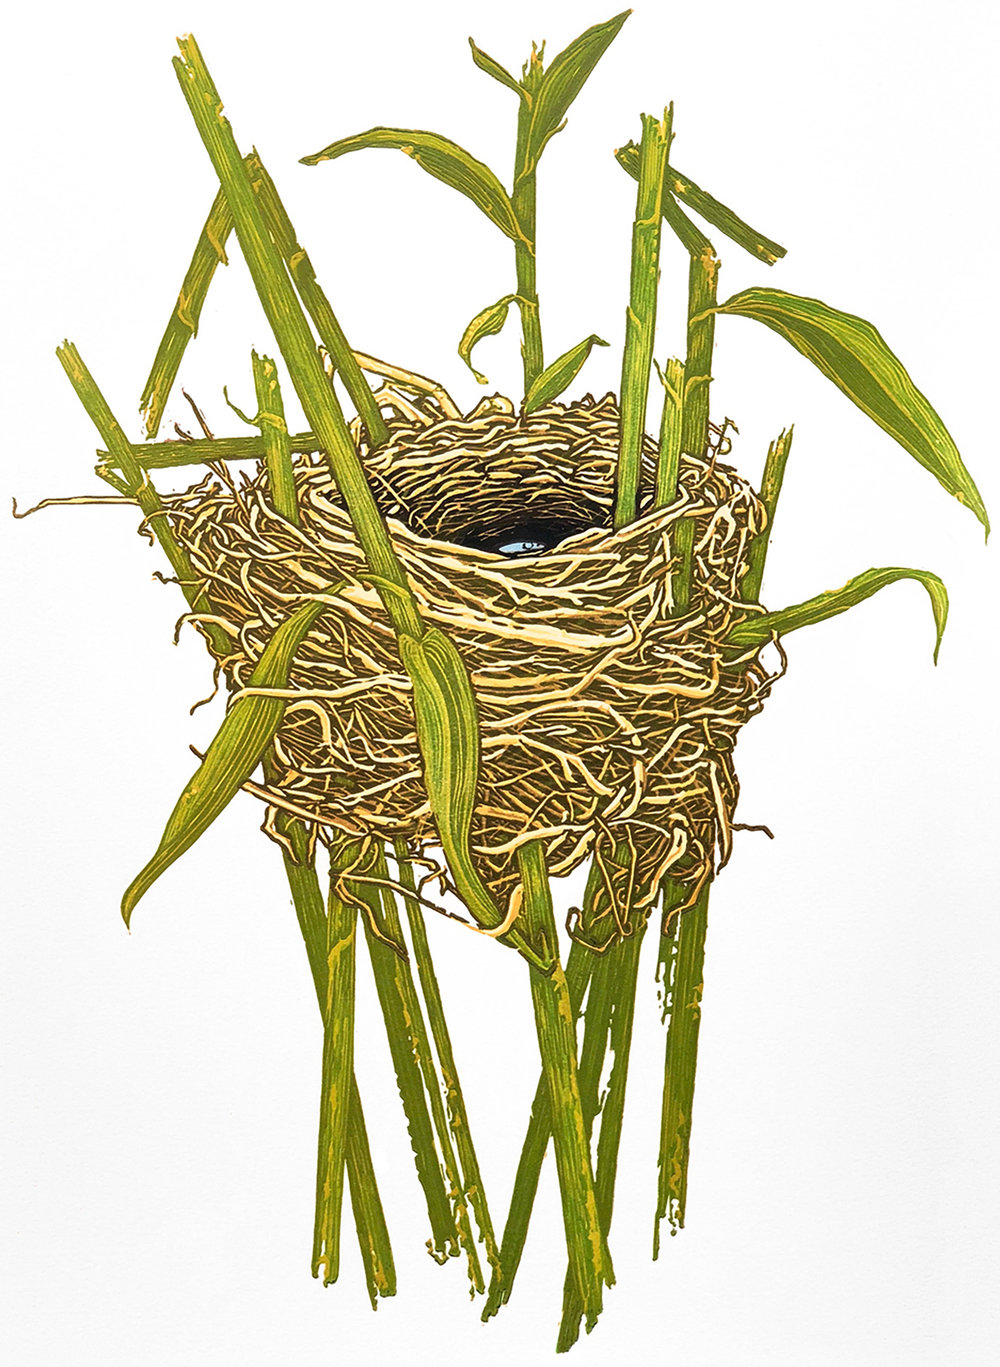 57 Monique Wales_Blackbirds in the Corn.jpg